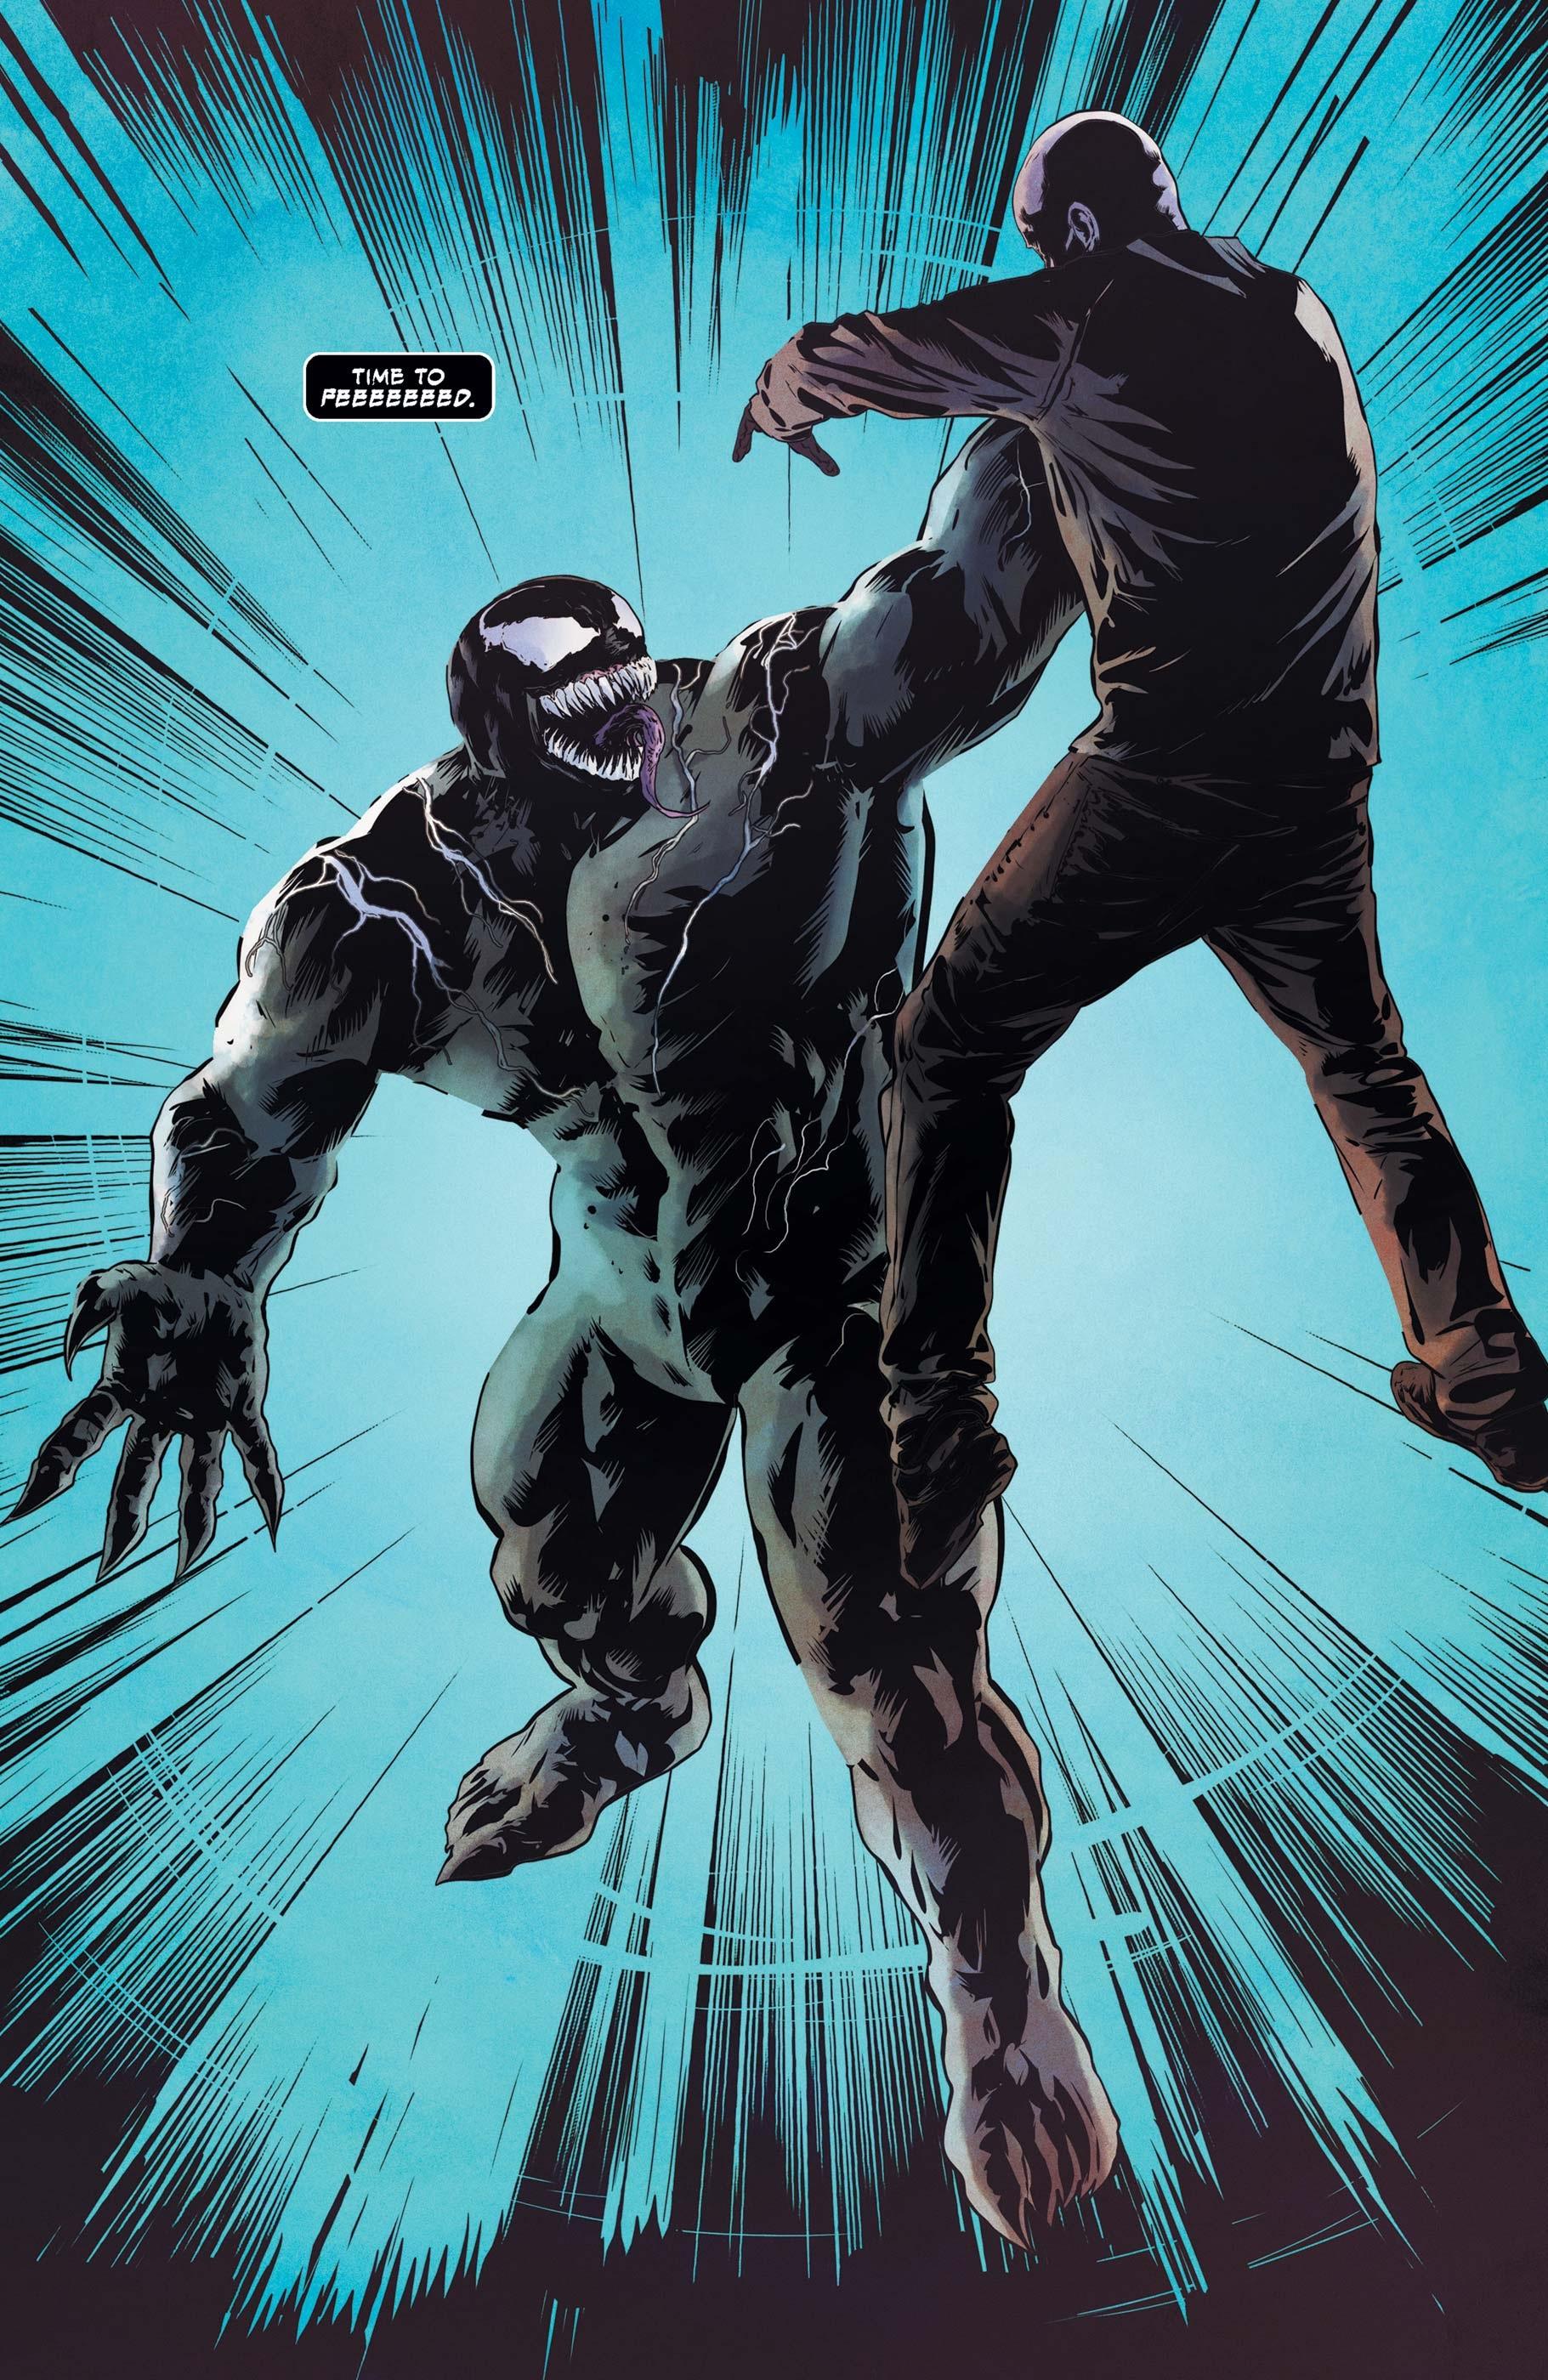 Venom Movie: Why Venom Is A PG-13 PLUS Online Venom Comic Here To Read